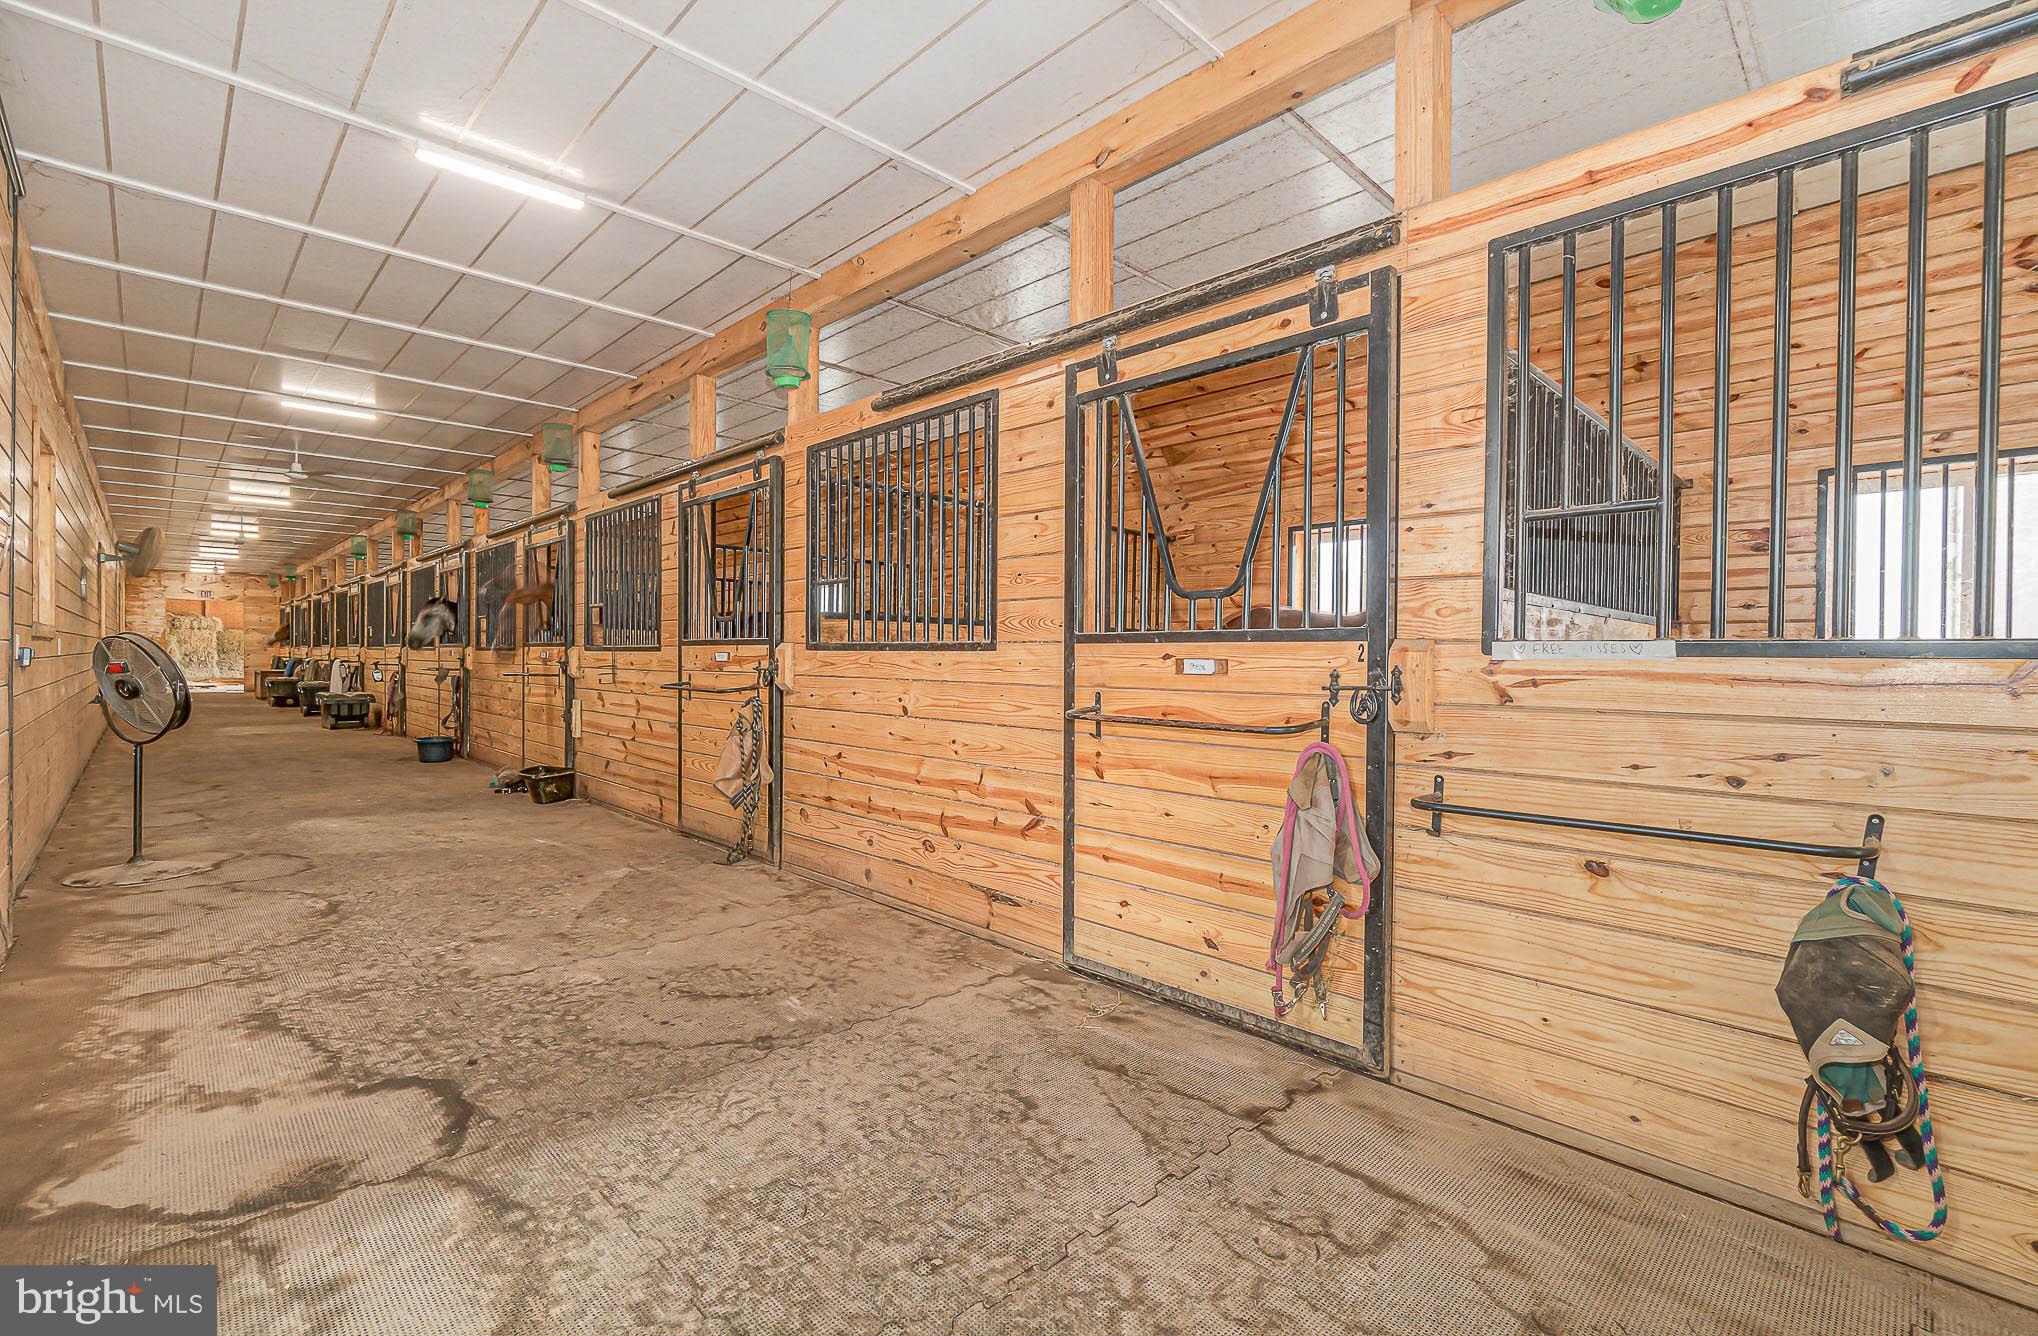 10 Comfort matted stalls, h/c wash & ceiling fans